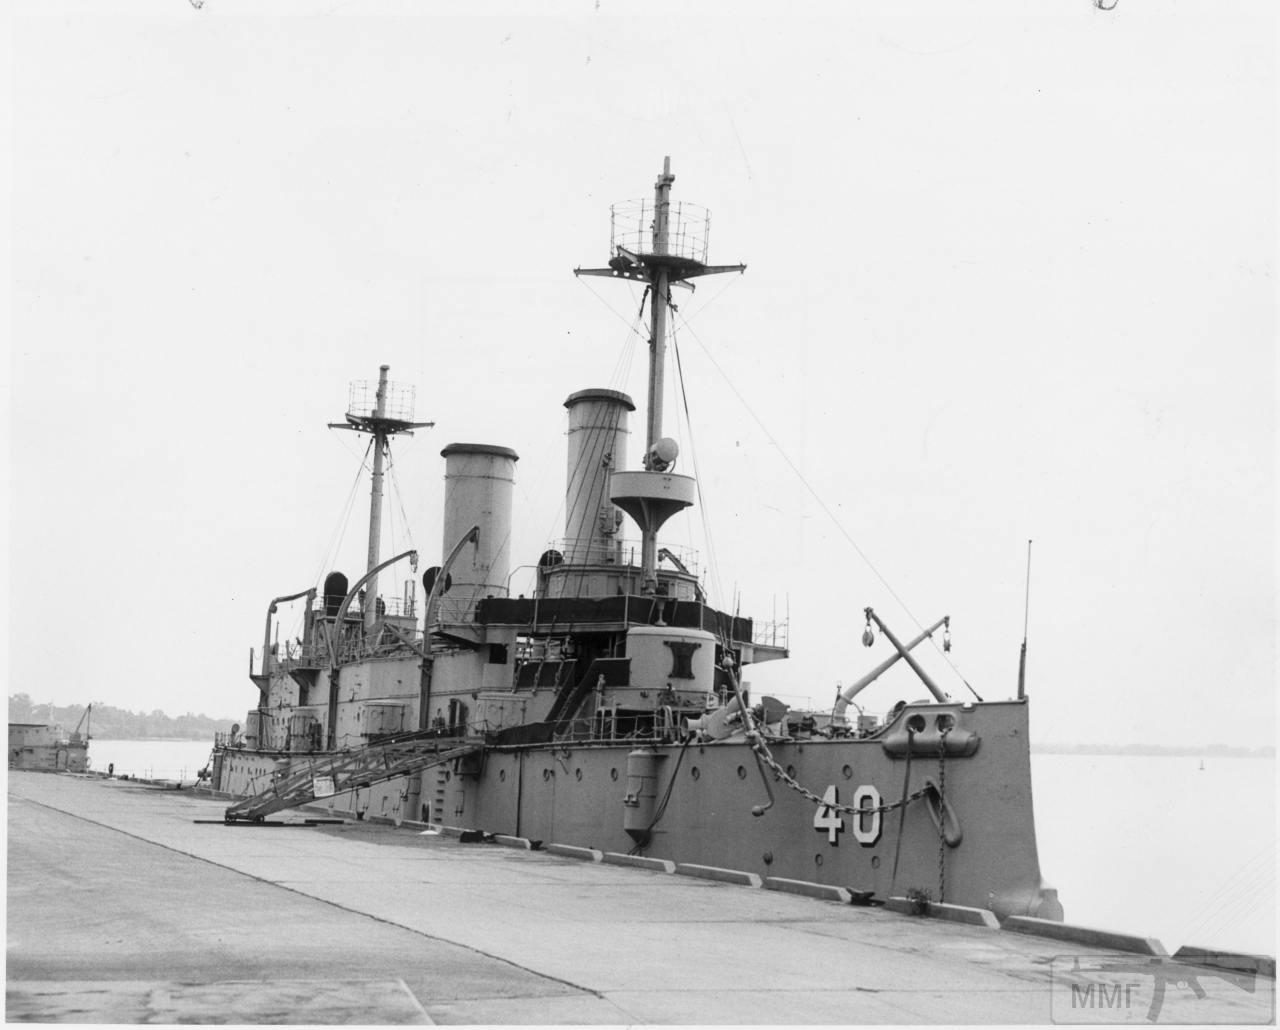 56131 - USS Olympia (C-6)